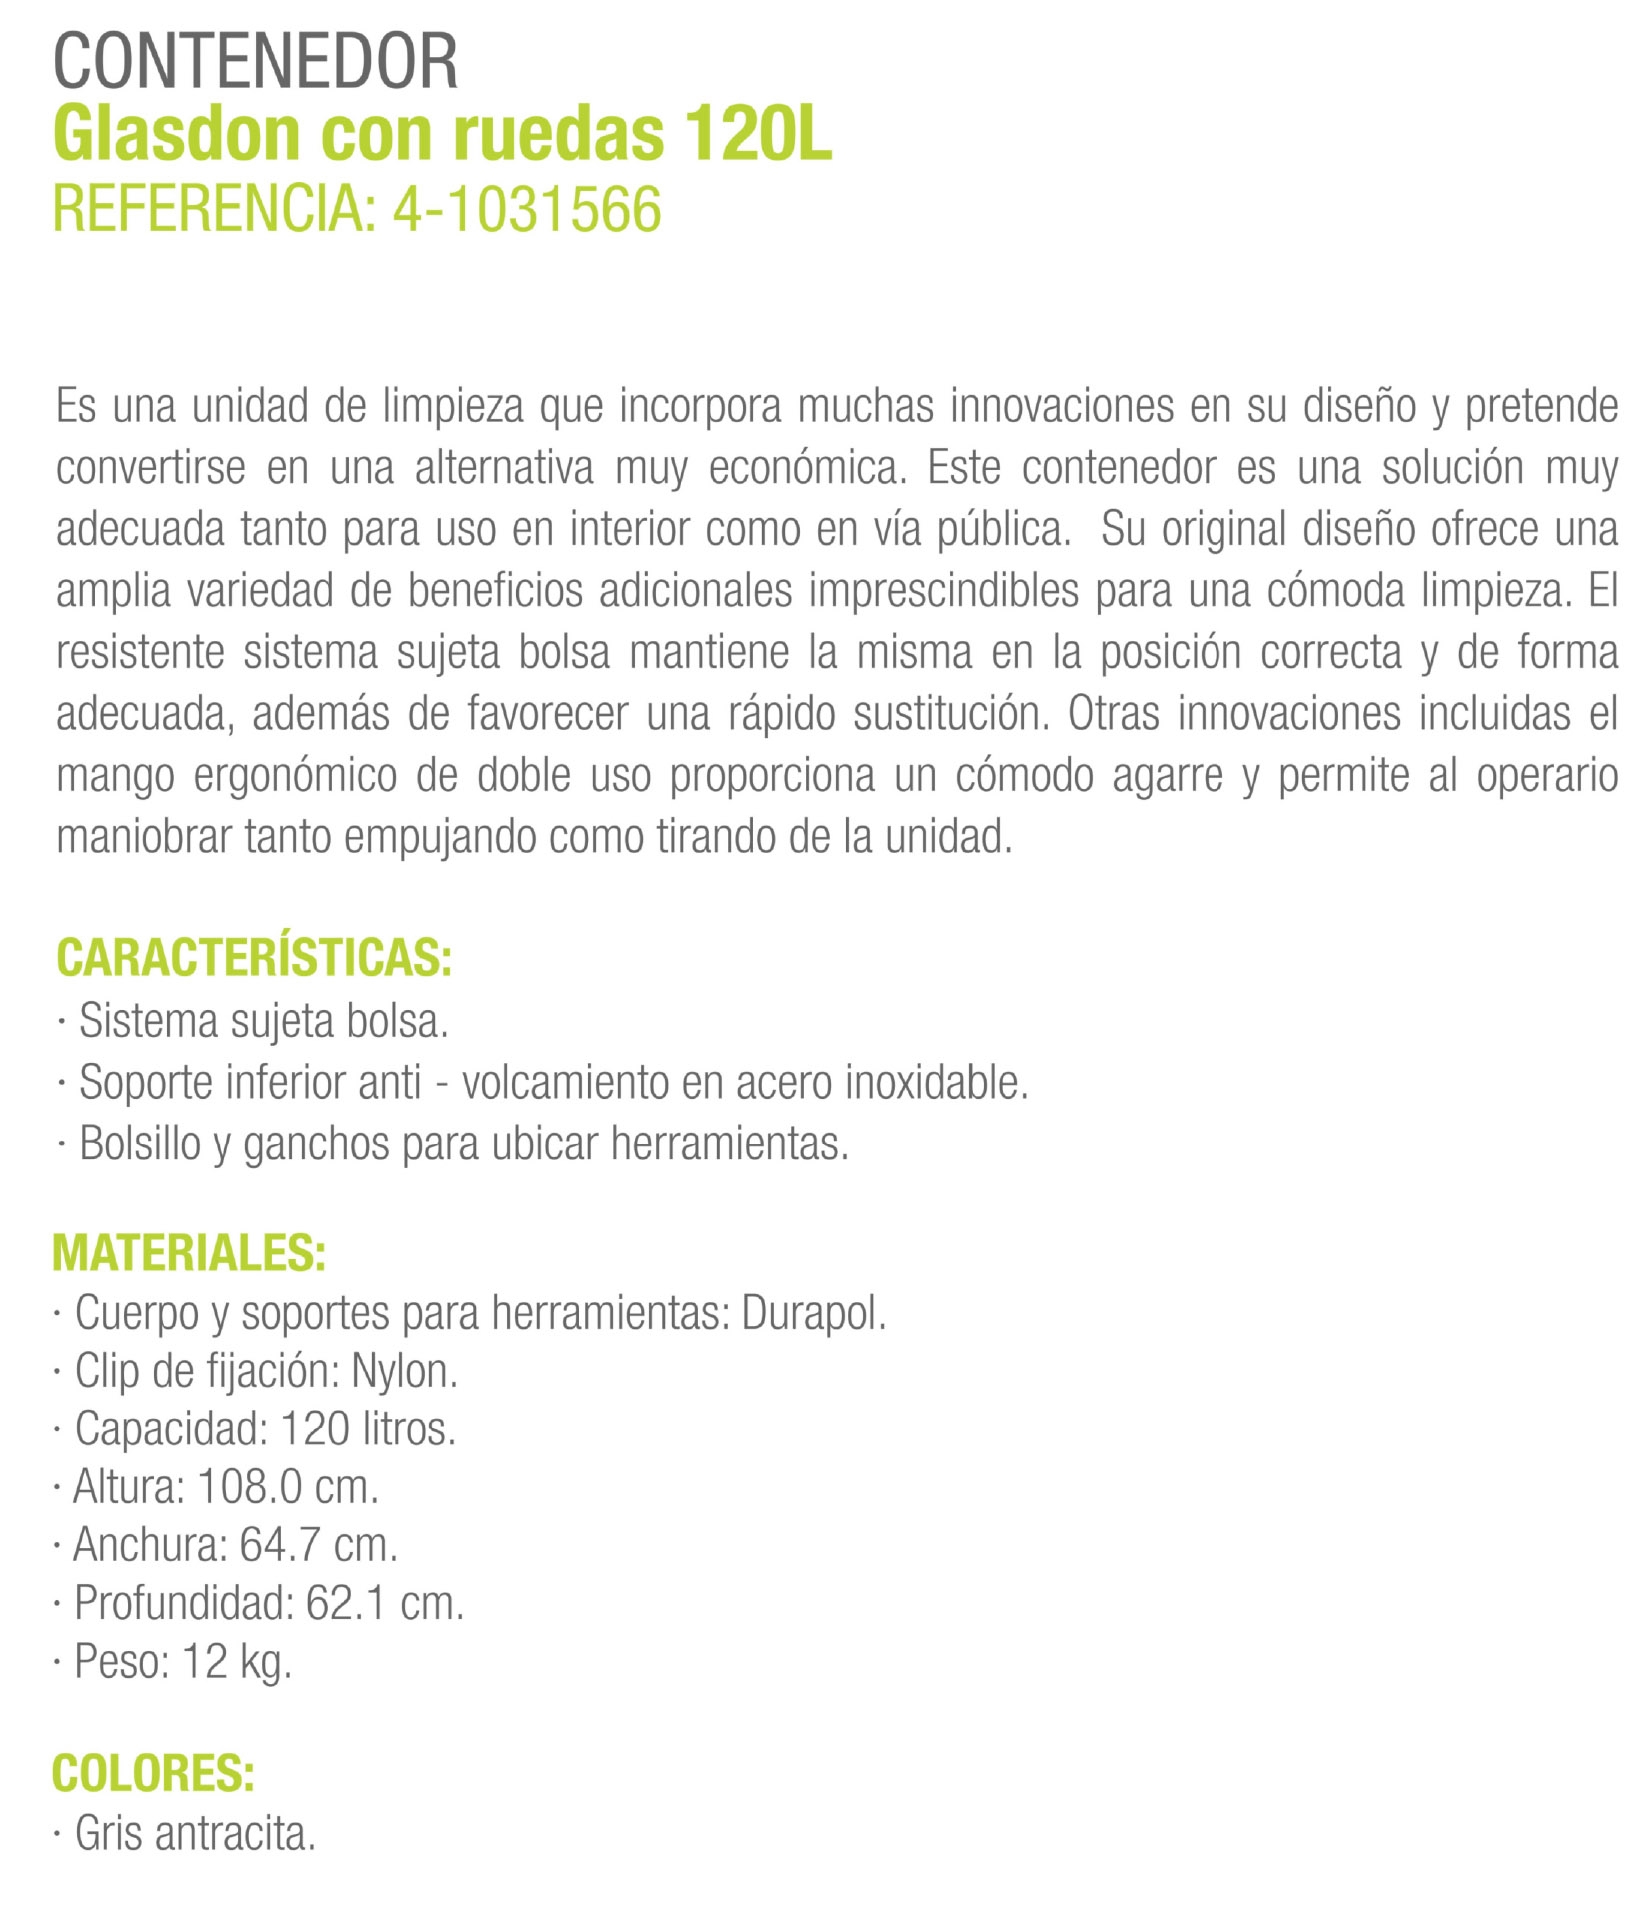 CARCATERISTICAS CARRO CONTENEDOR 200 LTS